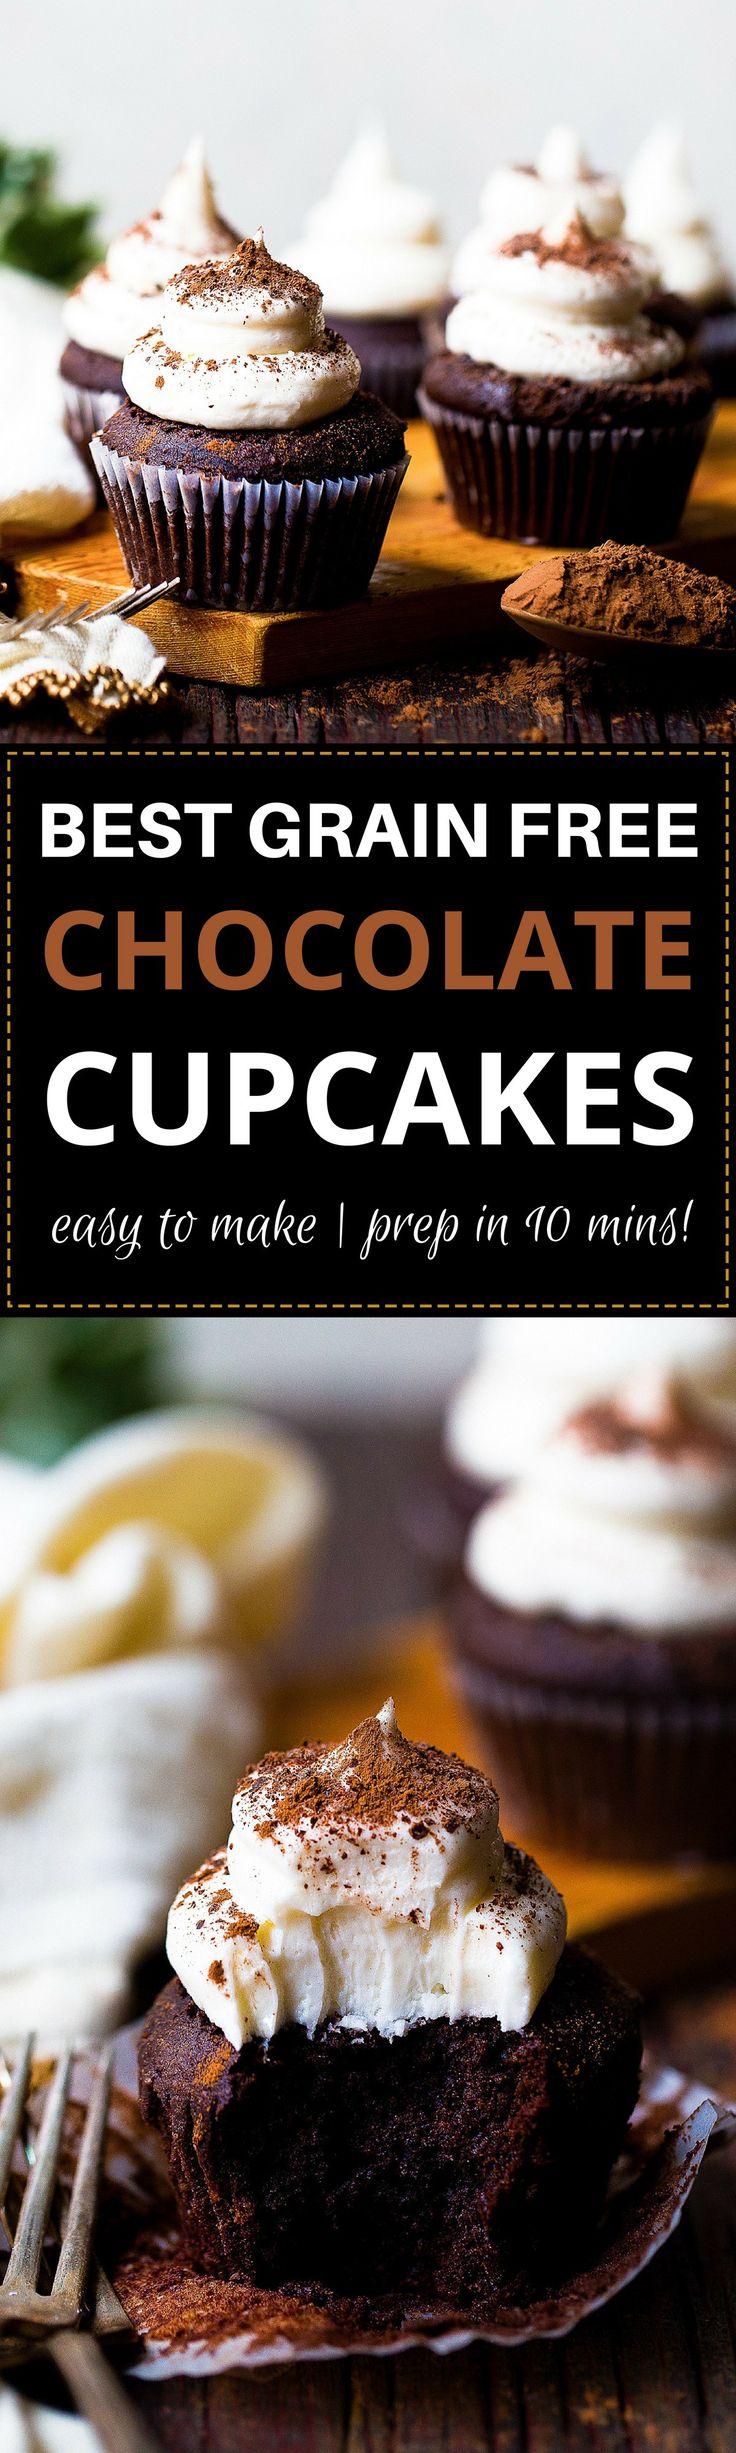 4248 best Dessert Bites: Cake Recipes images on Pinterest ...